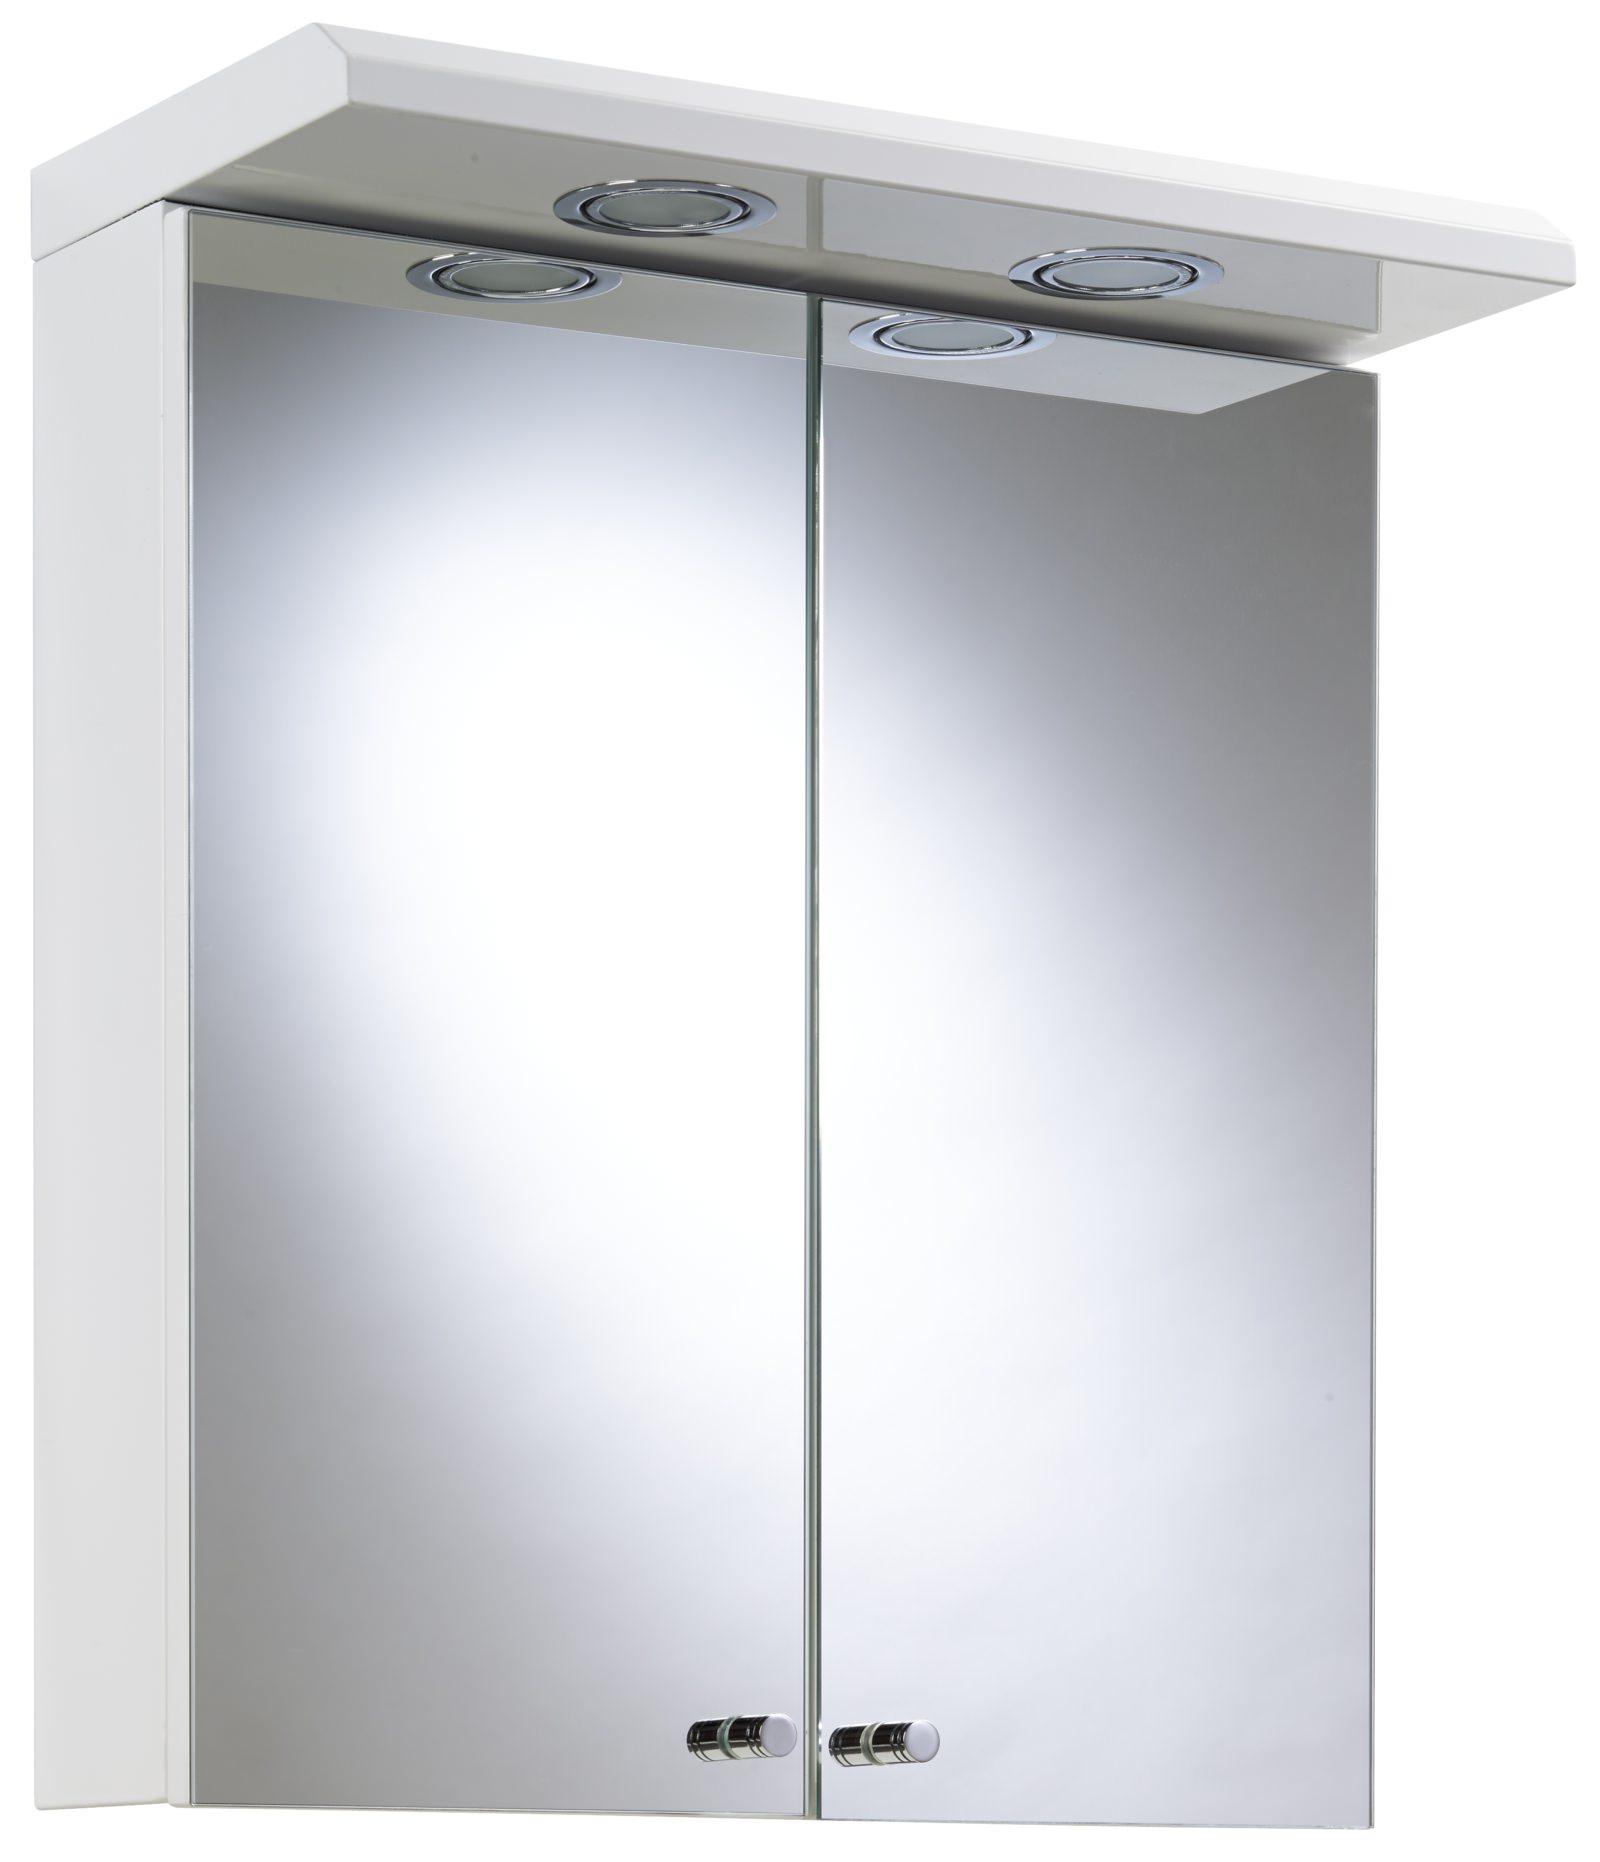 croydex shire white double door illuminated cabinet 450 x